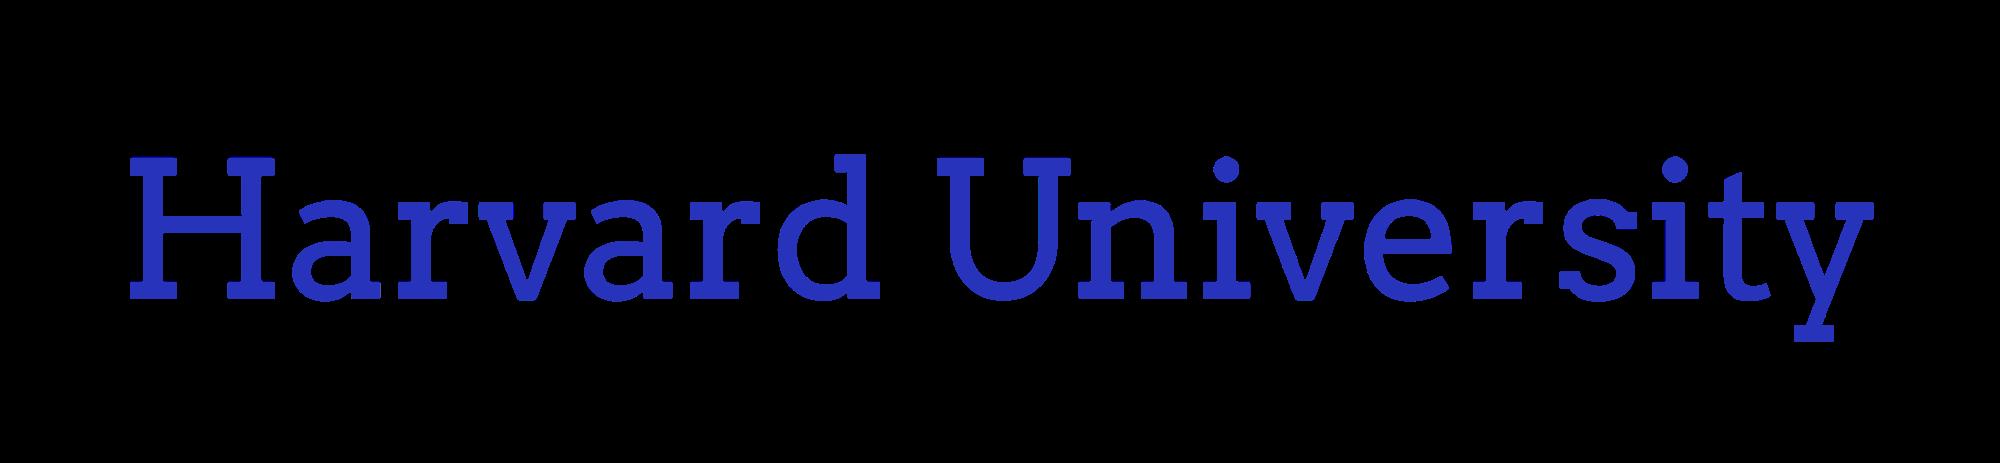 Harvard University-logo.png